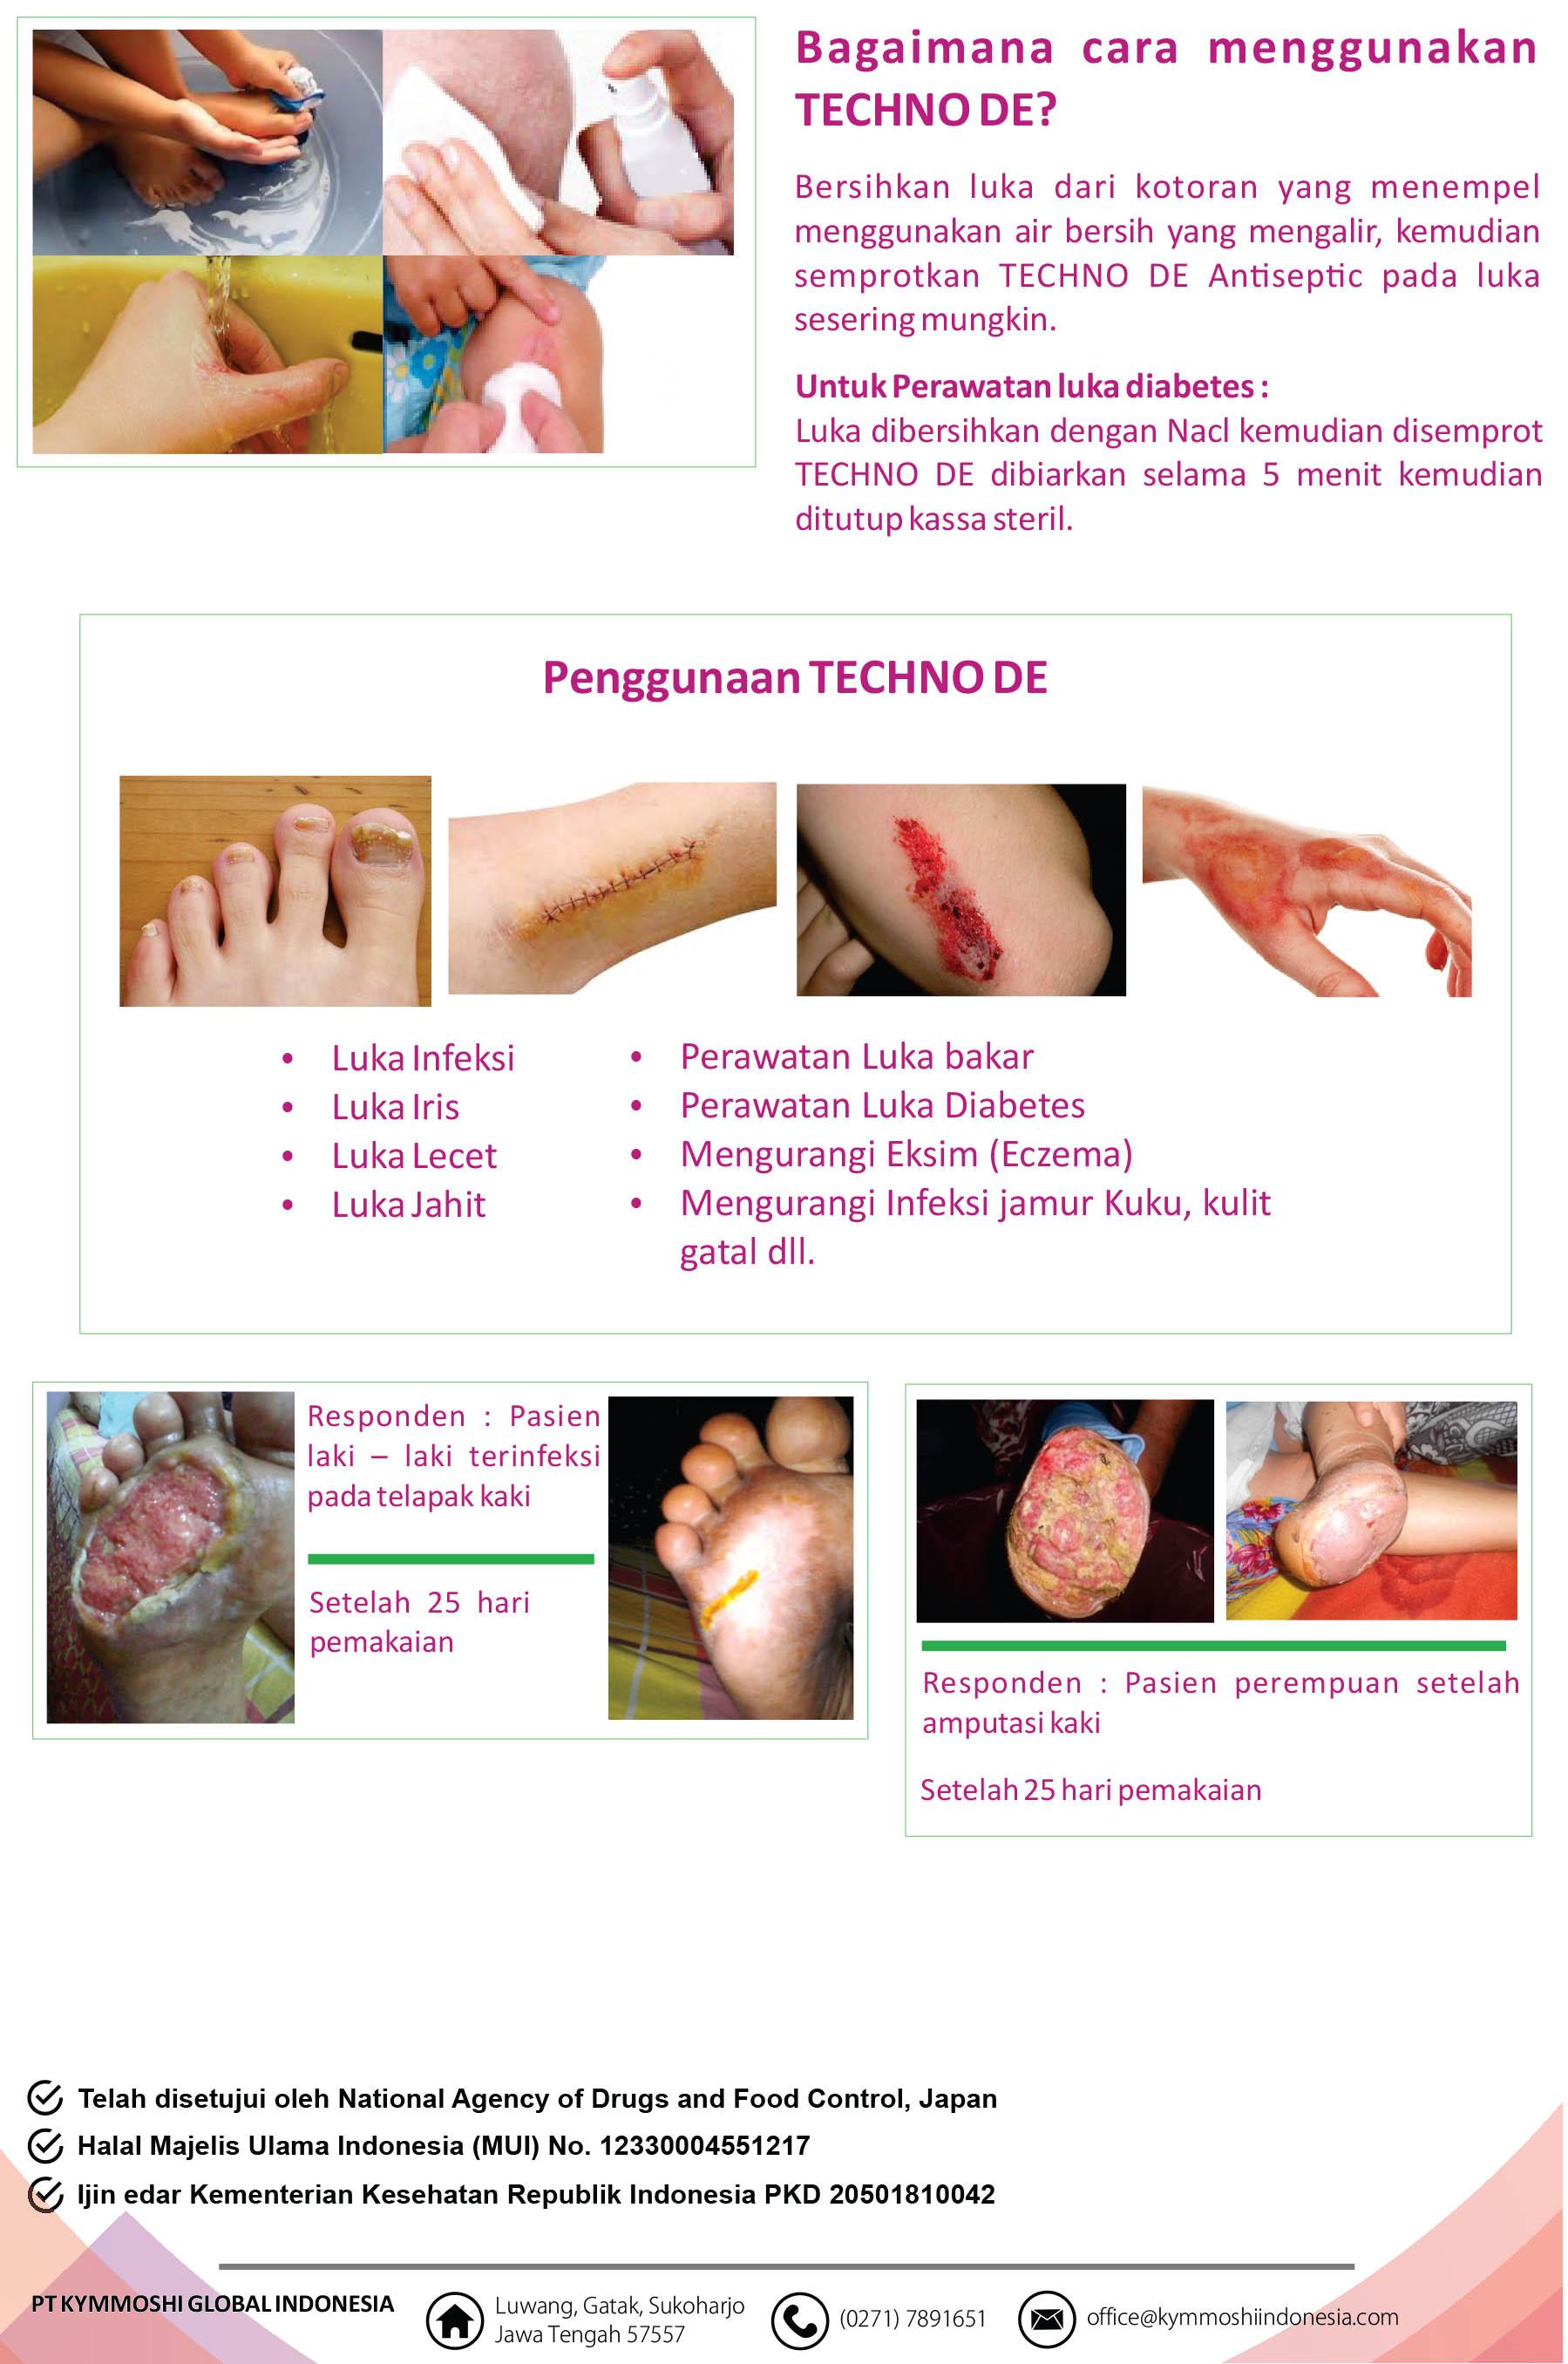 Antiseptic Revnew.cdr